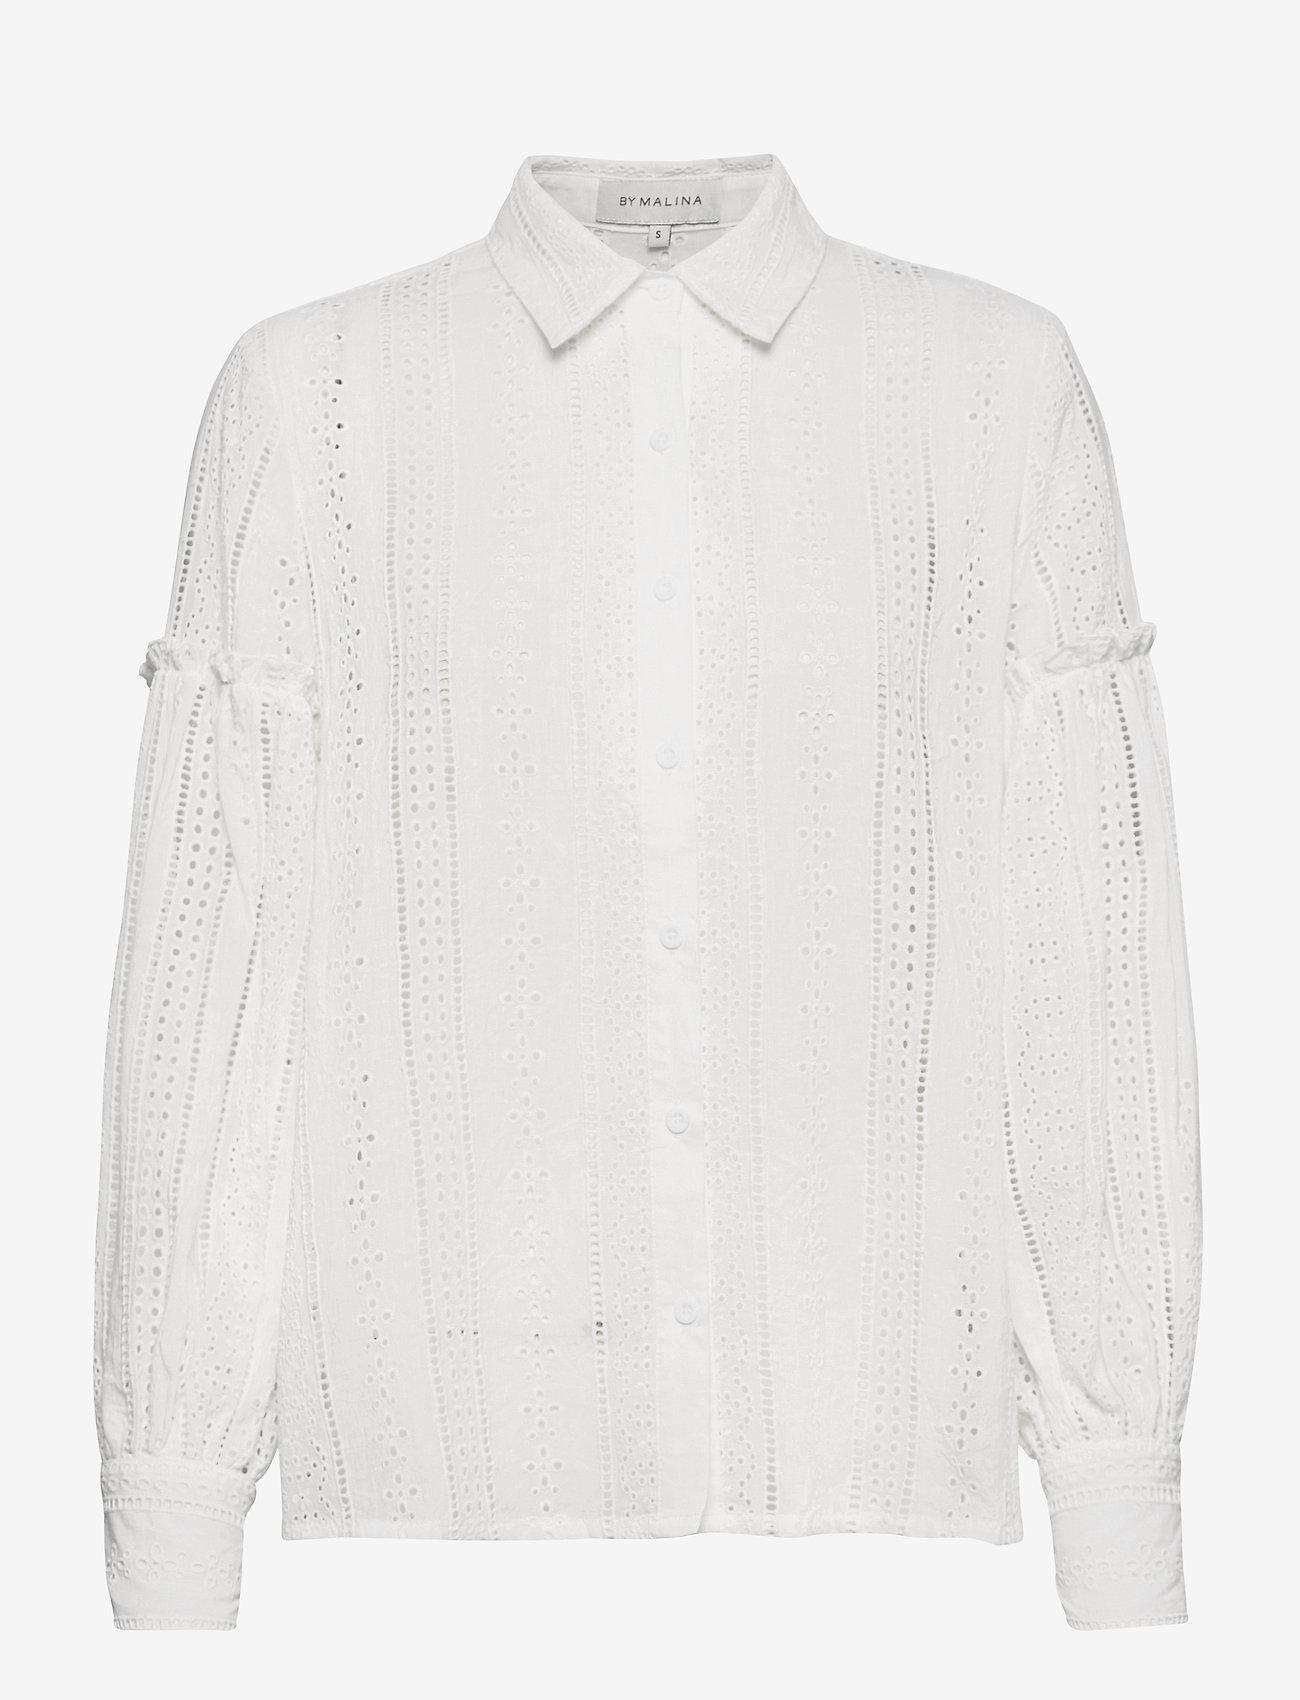 By Malina - Juno blouse - långärmade skjortor - white - 0